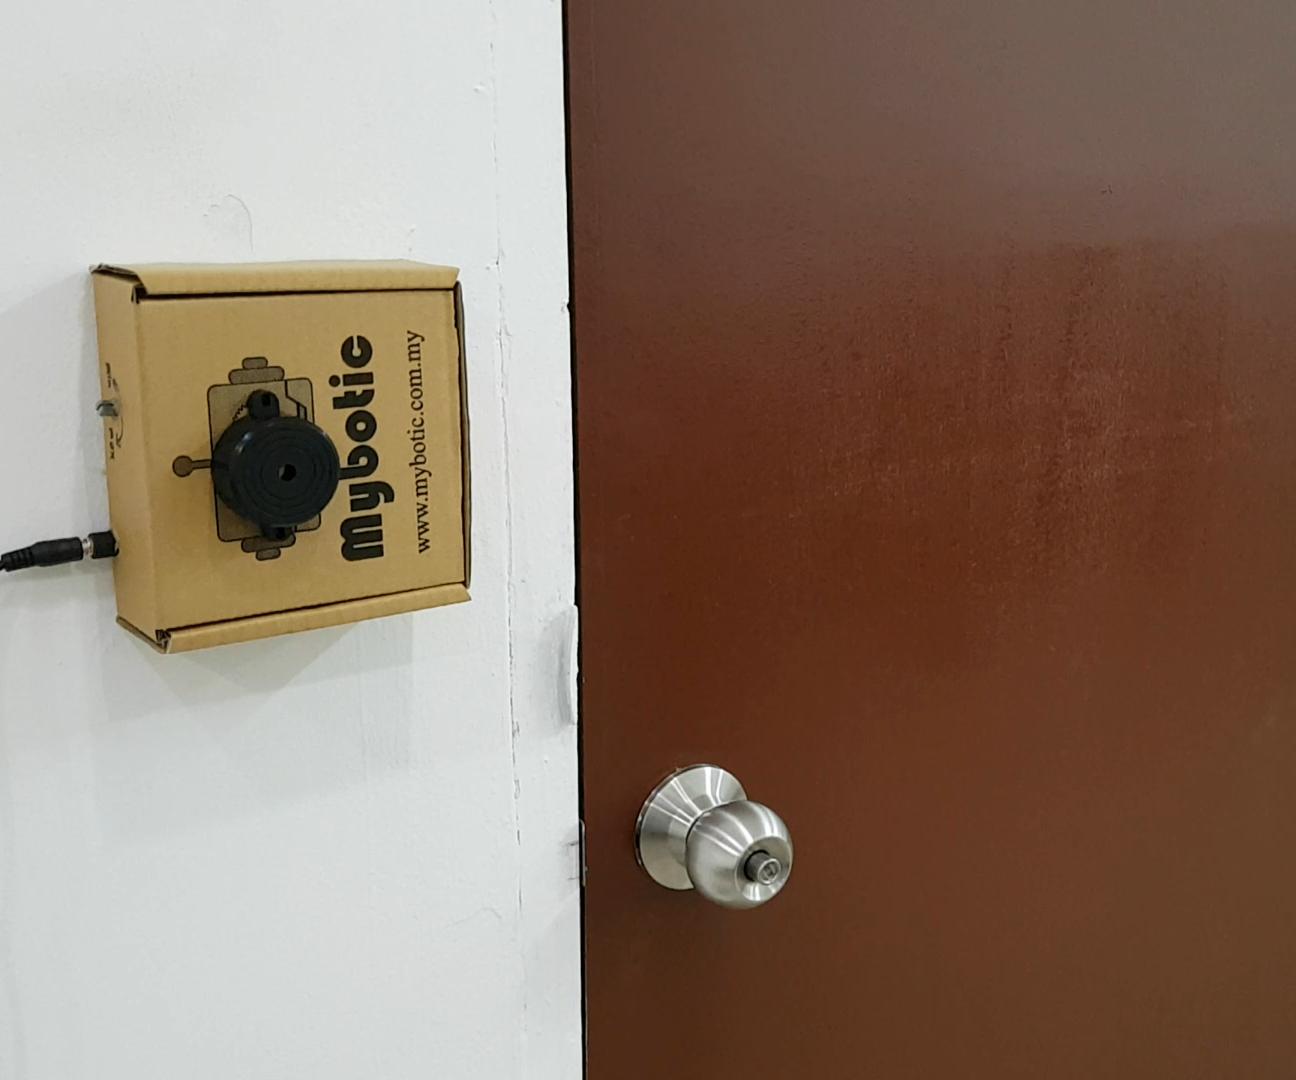 Tutorial: How to Make Laser Alarm System